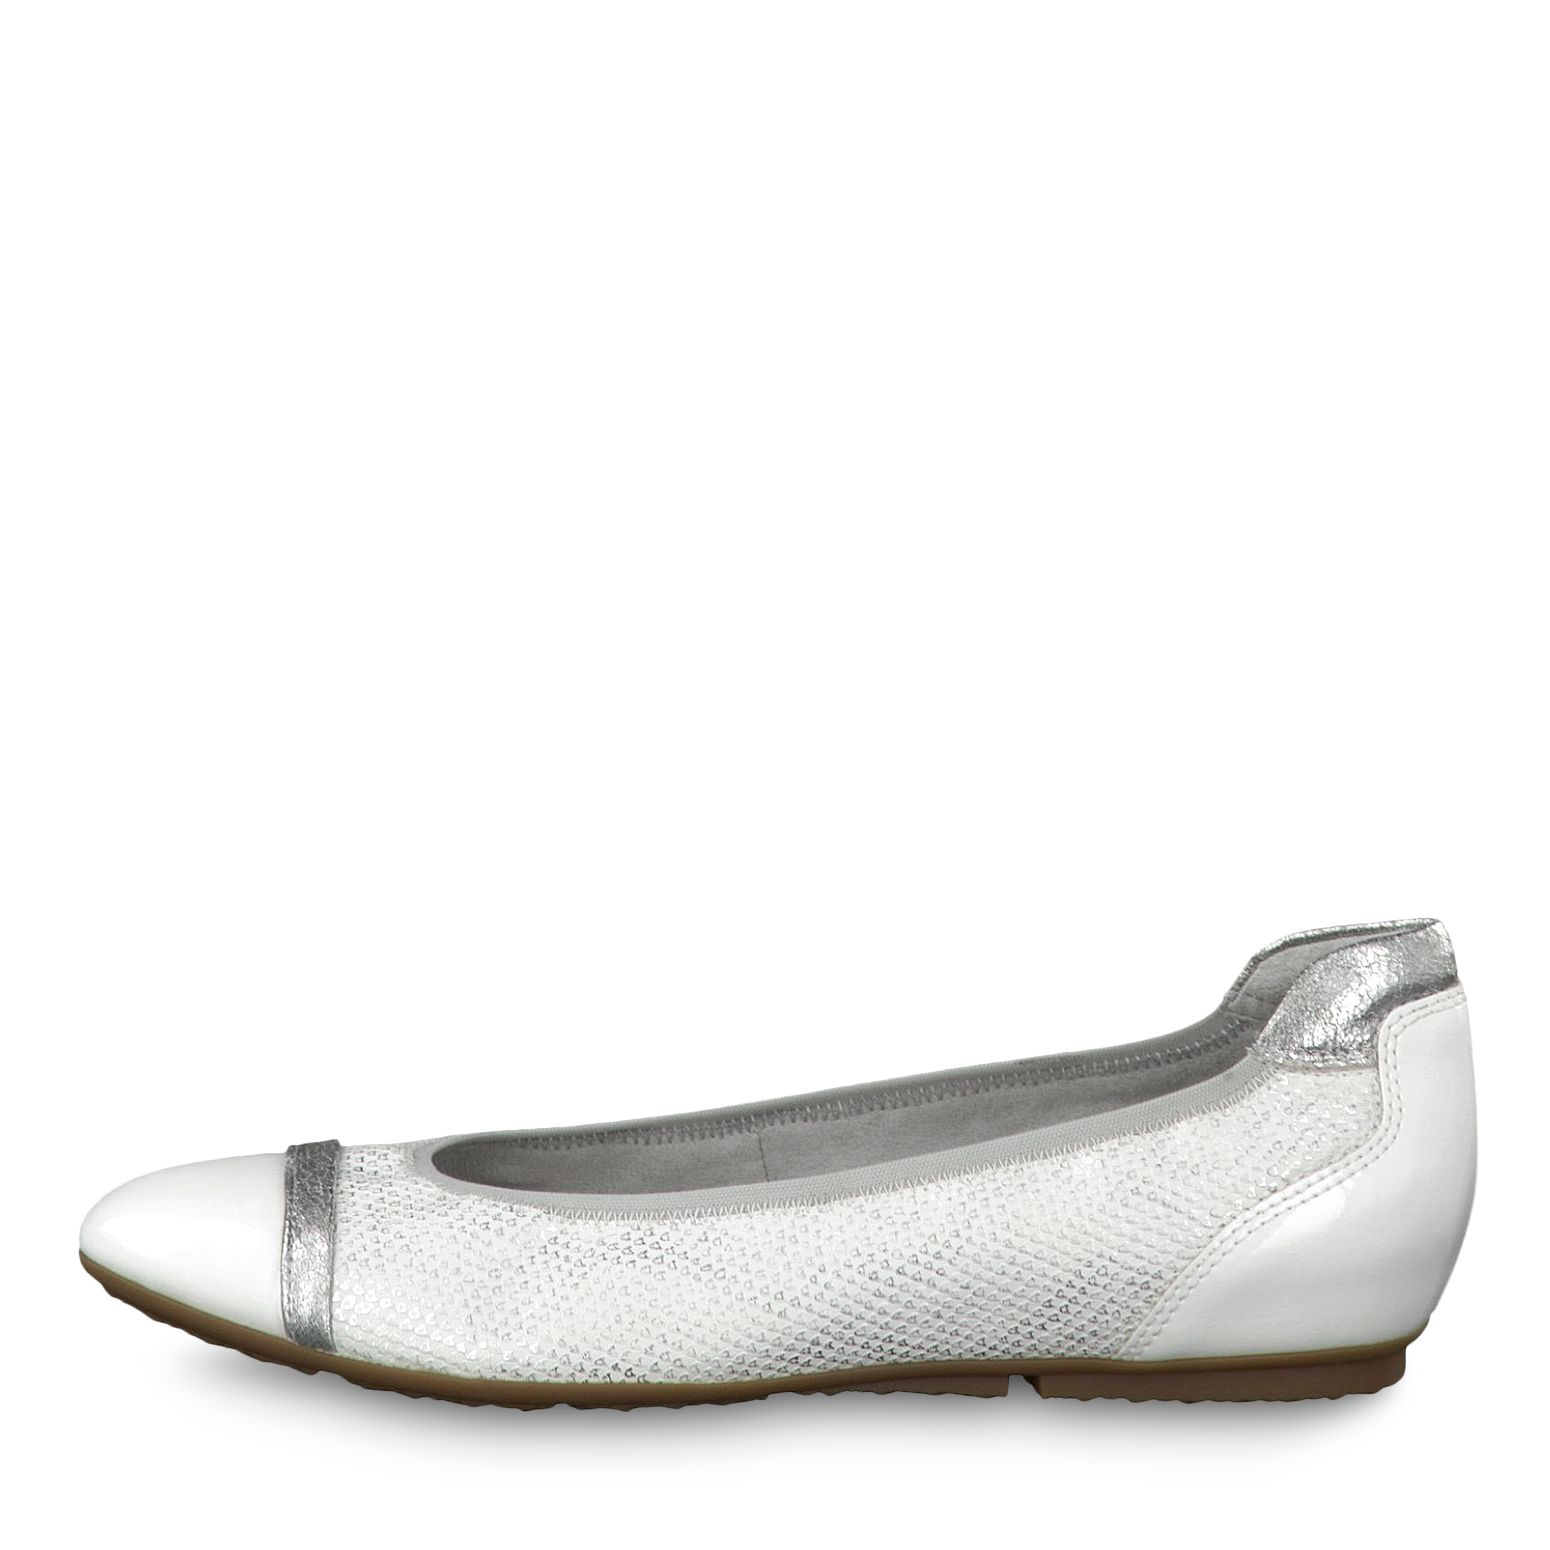 Buy Joya Shoes Online